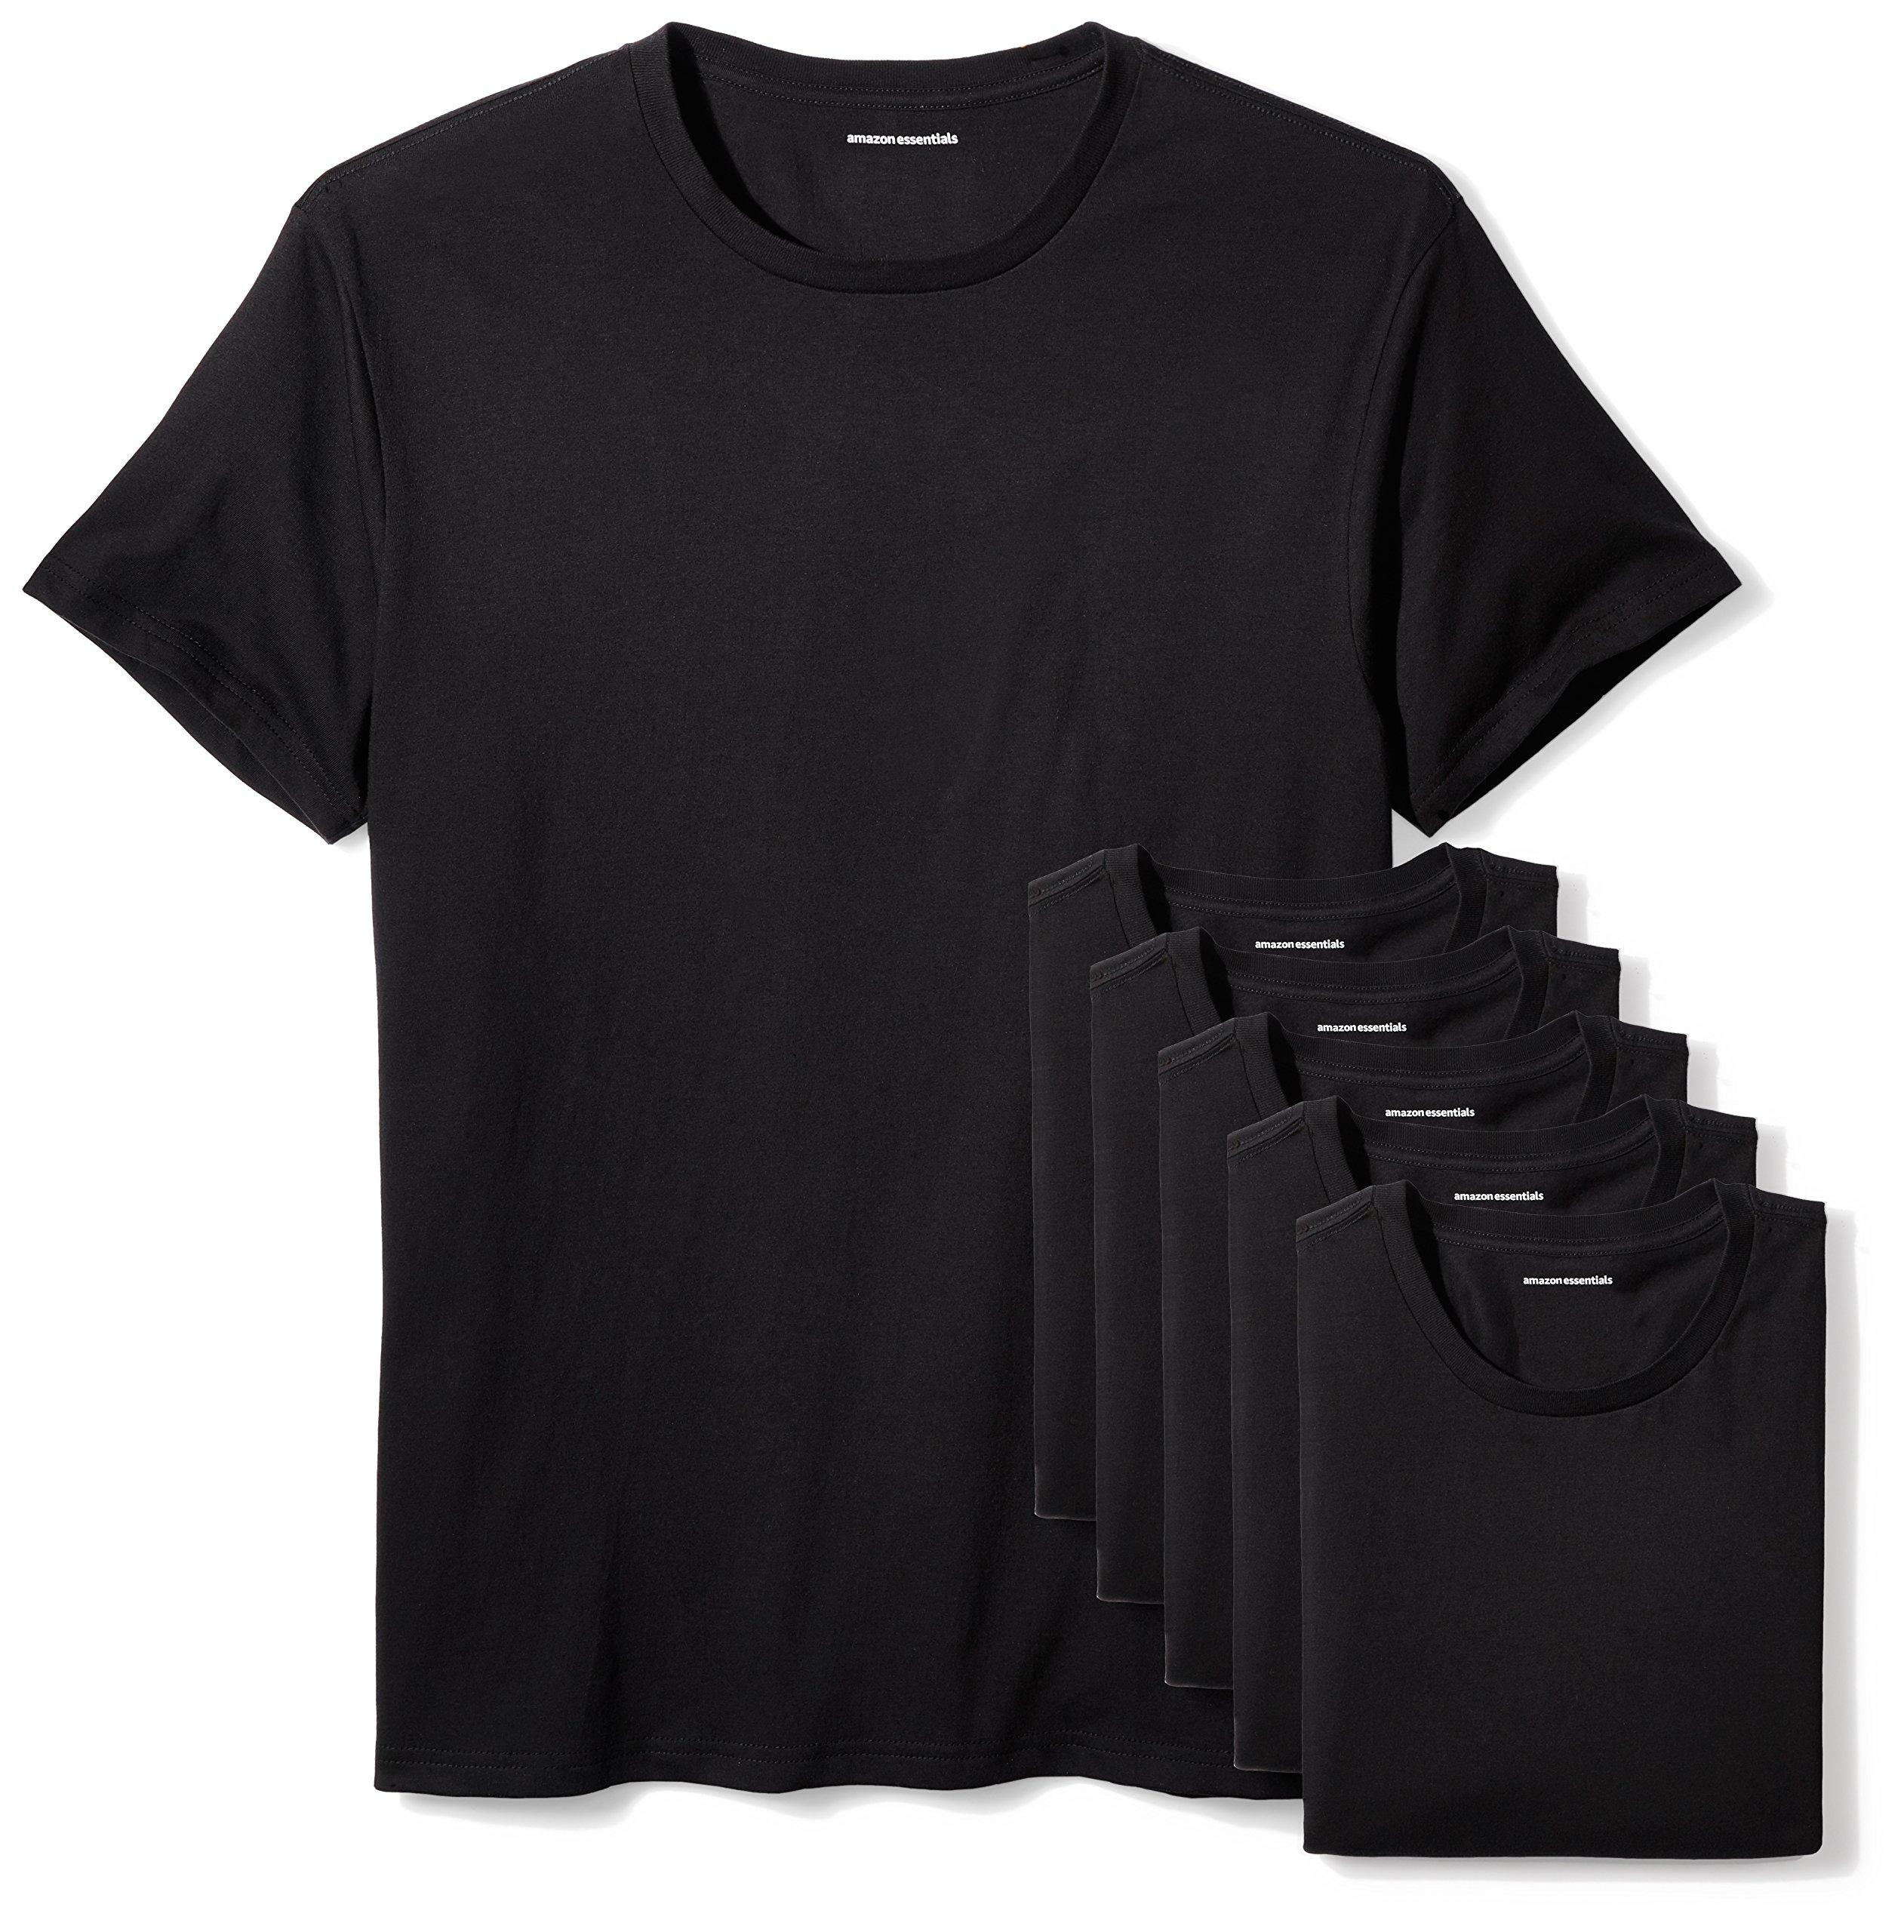 Amazon Essentials Men's 6-Pack Crewneck Undershirts, Black, XX-Large by Amazon Essentials